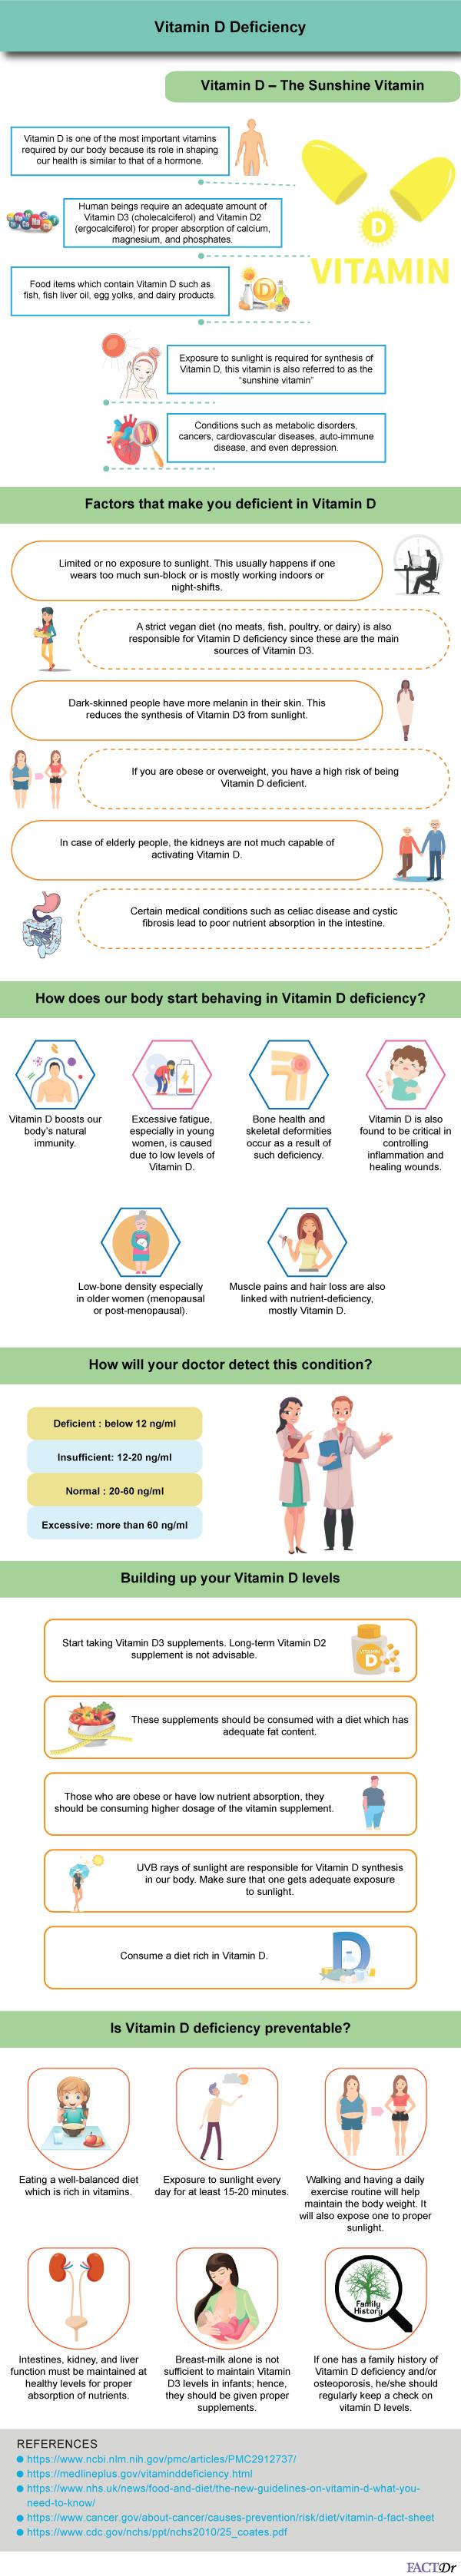 Vitamin D Deficiency test